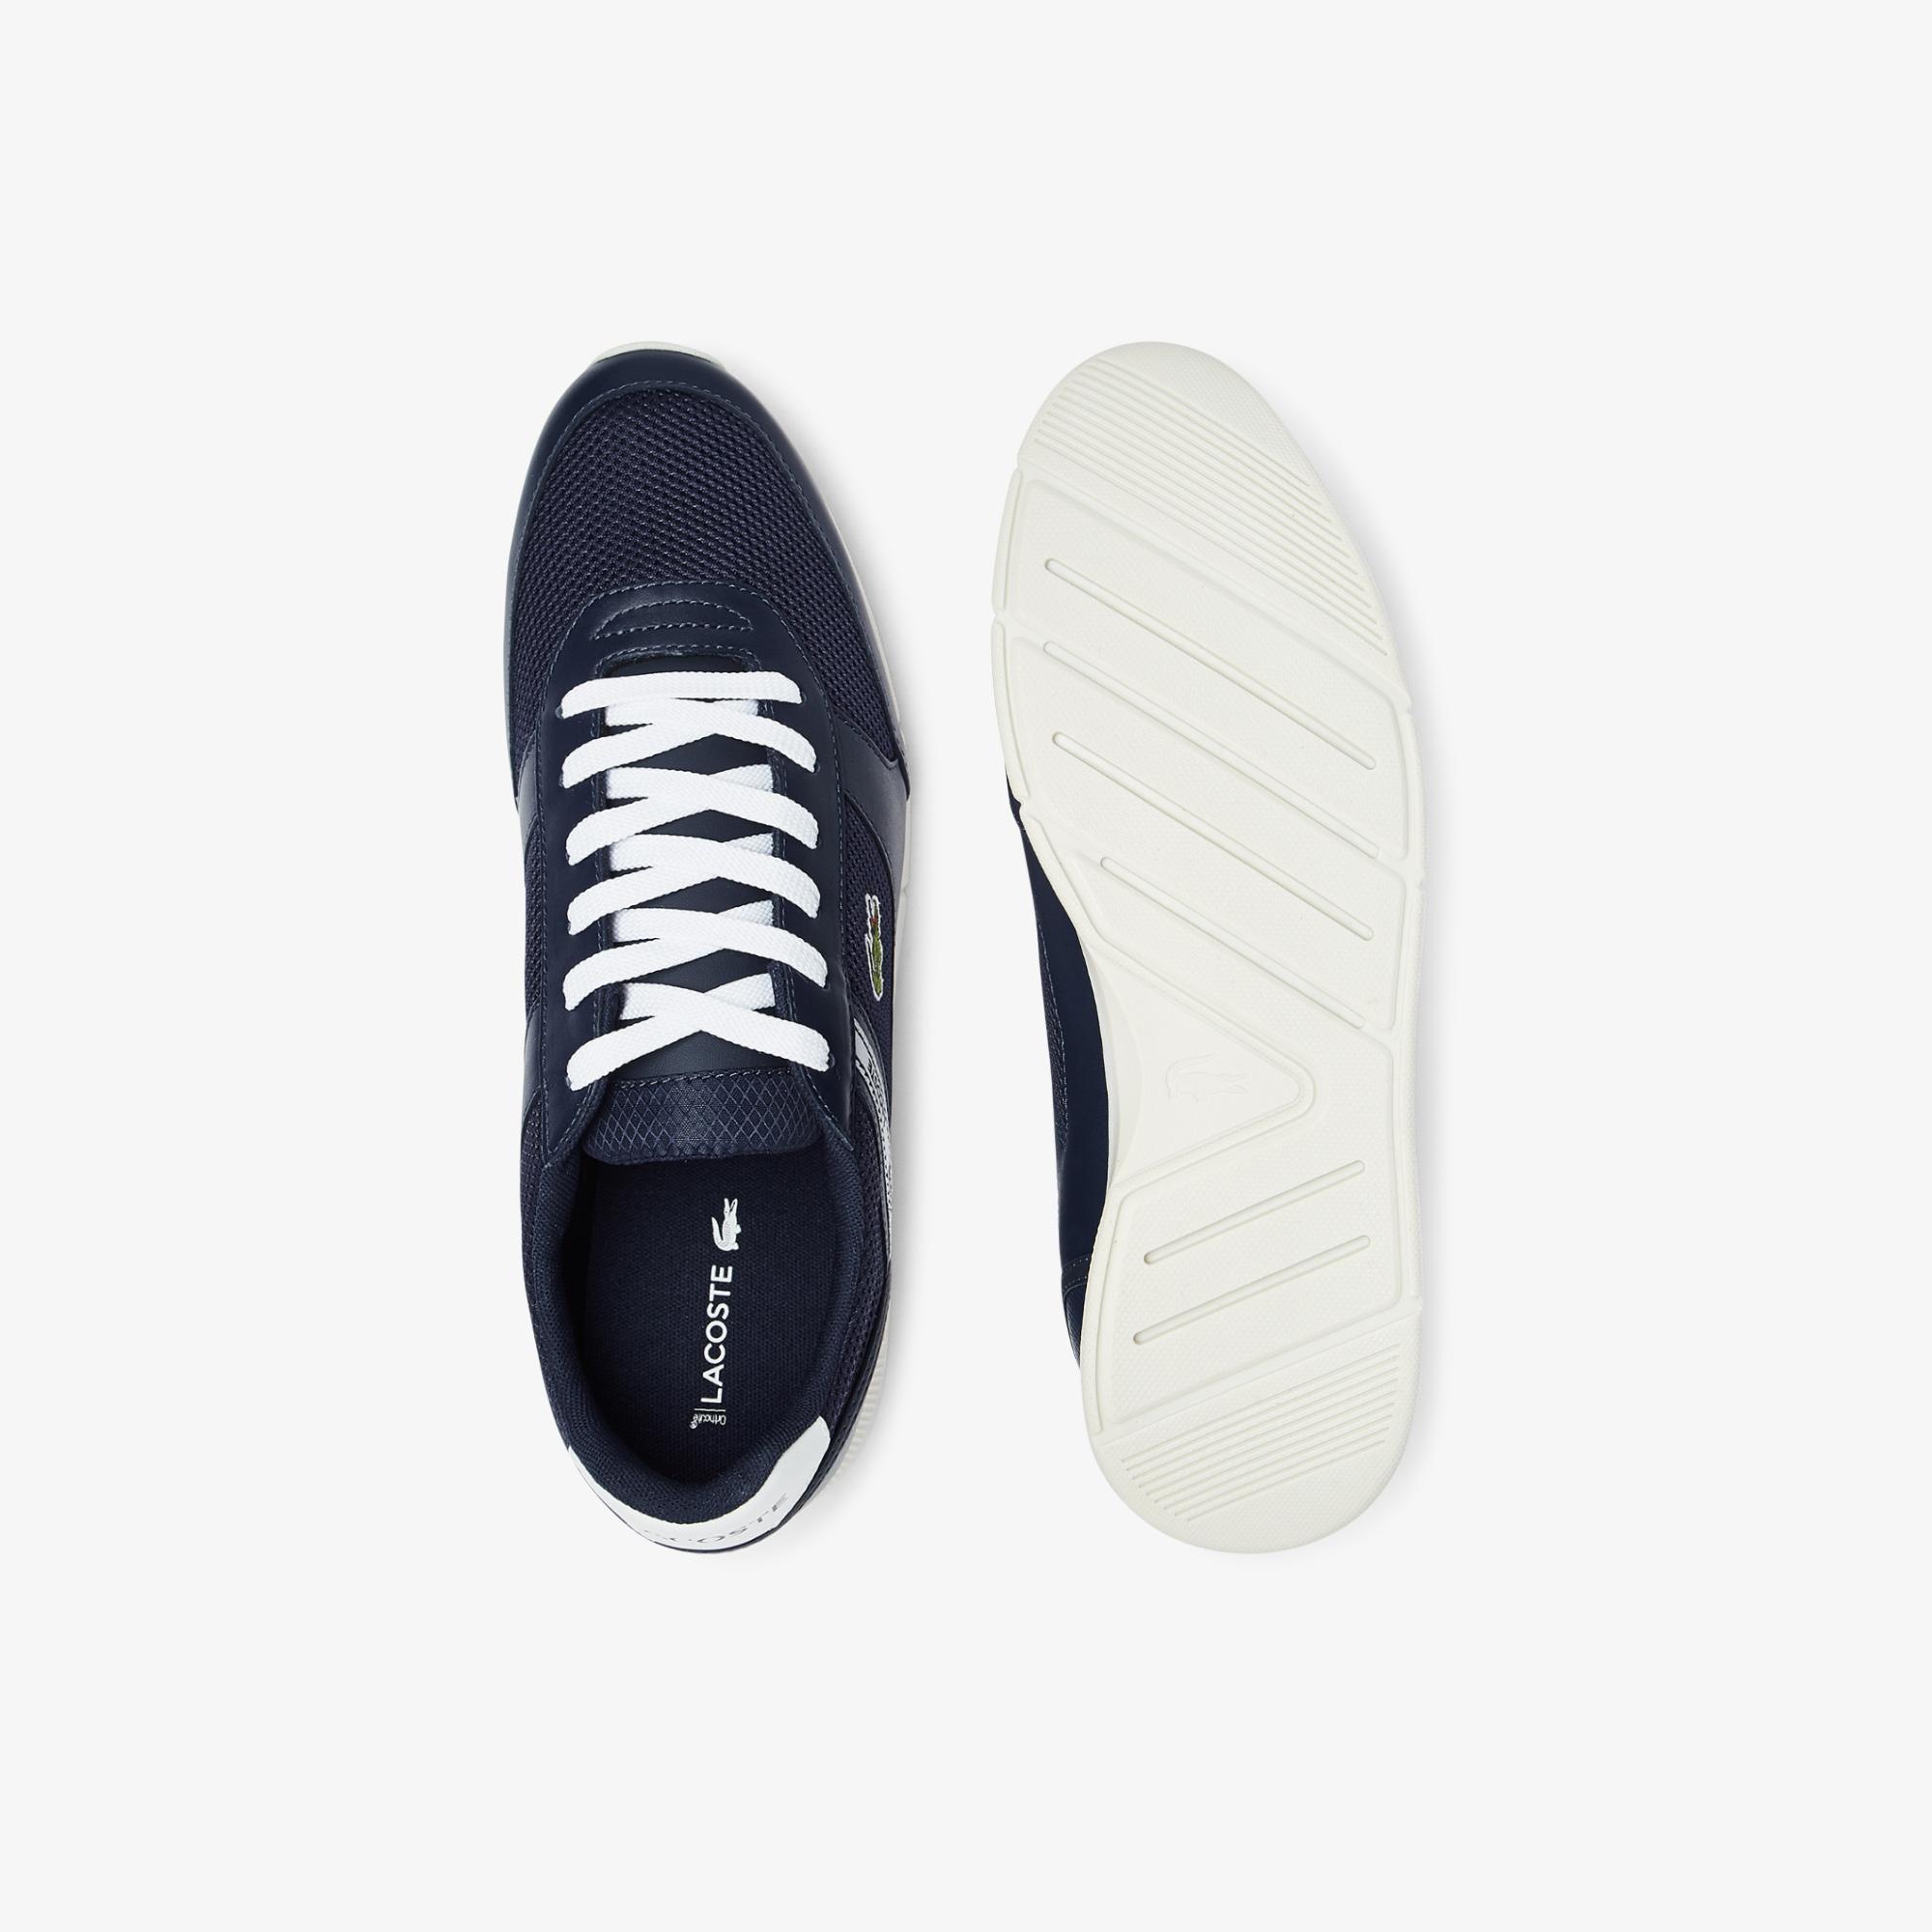 Lacoste Menerva Sport 0721 1 Cma Erkek Lacivert - Beyaz Sneaker